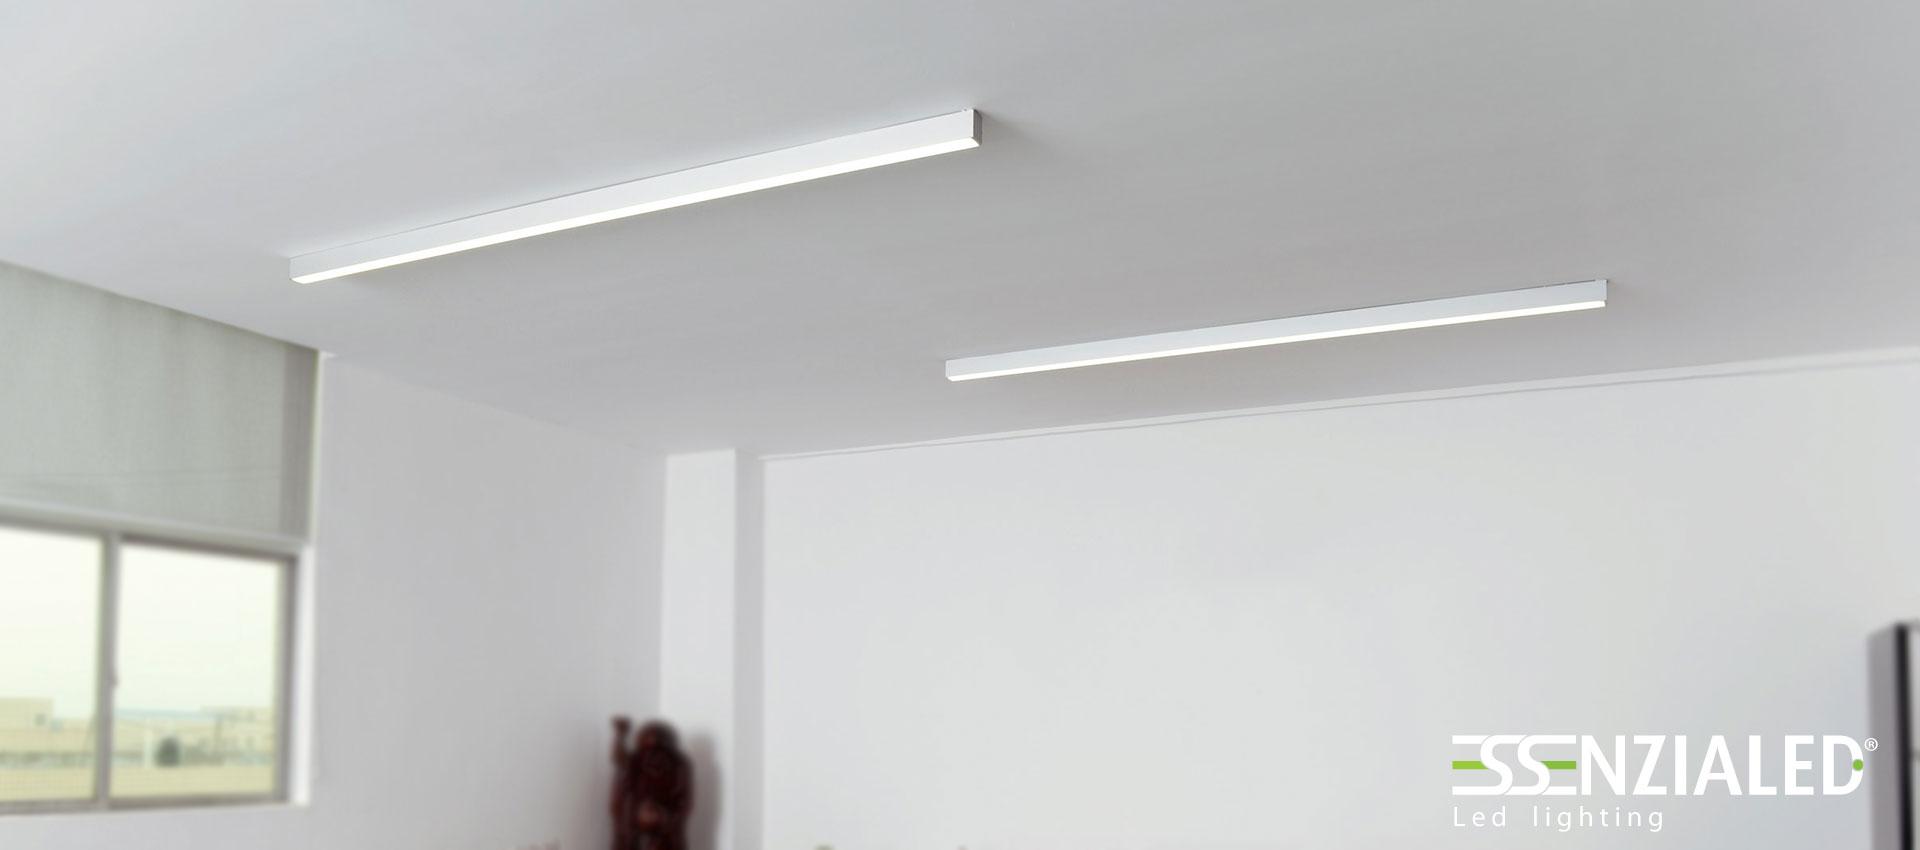 Power in xl profili a led a sospensione essenzialedessenzialed illuminazione a led - Illuminazione bagno led ...